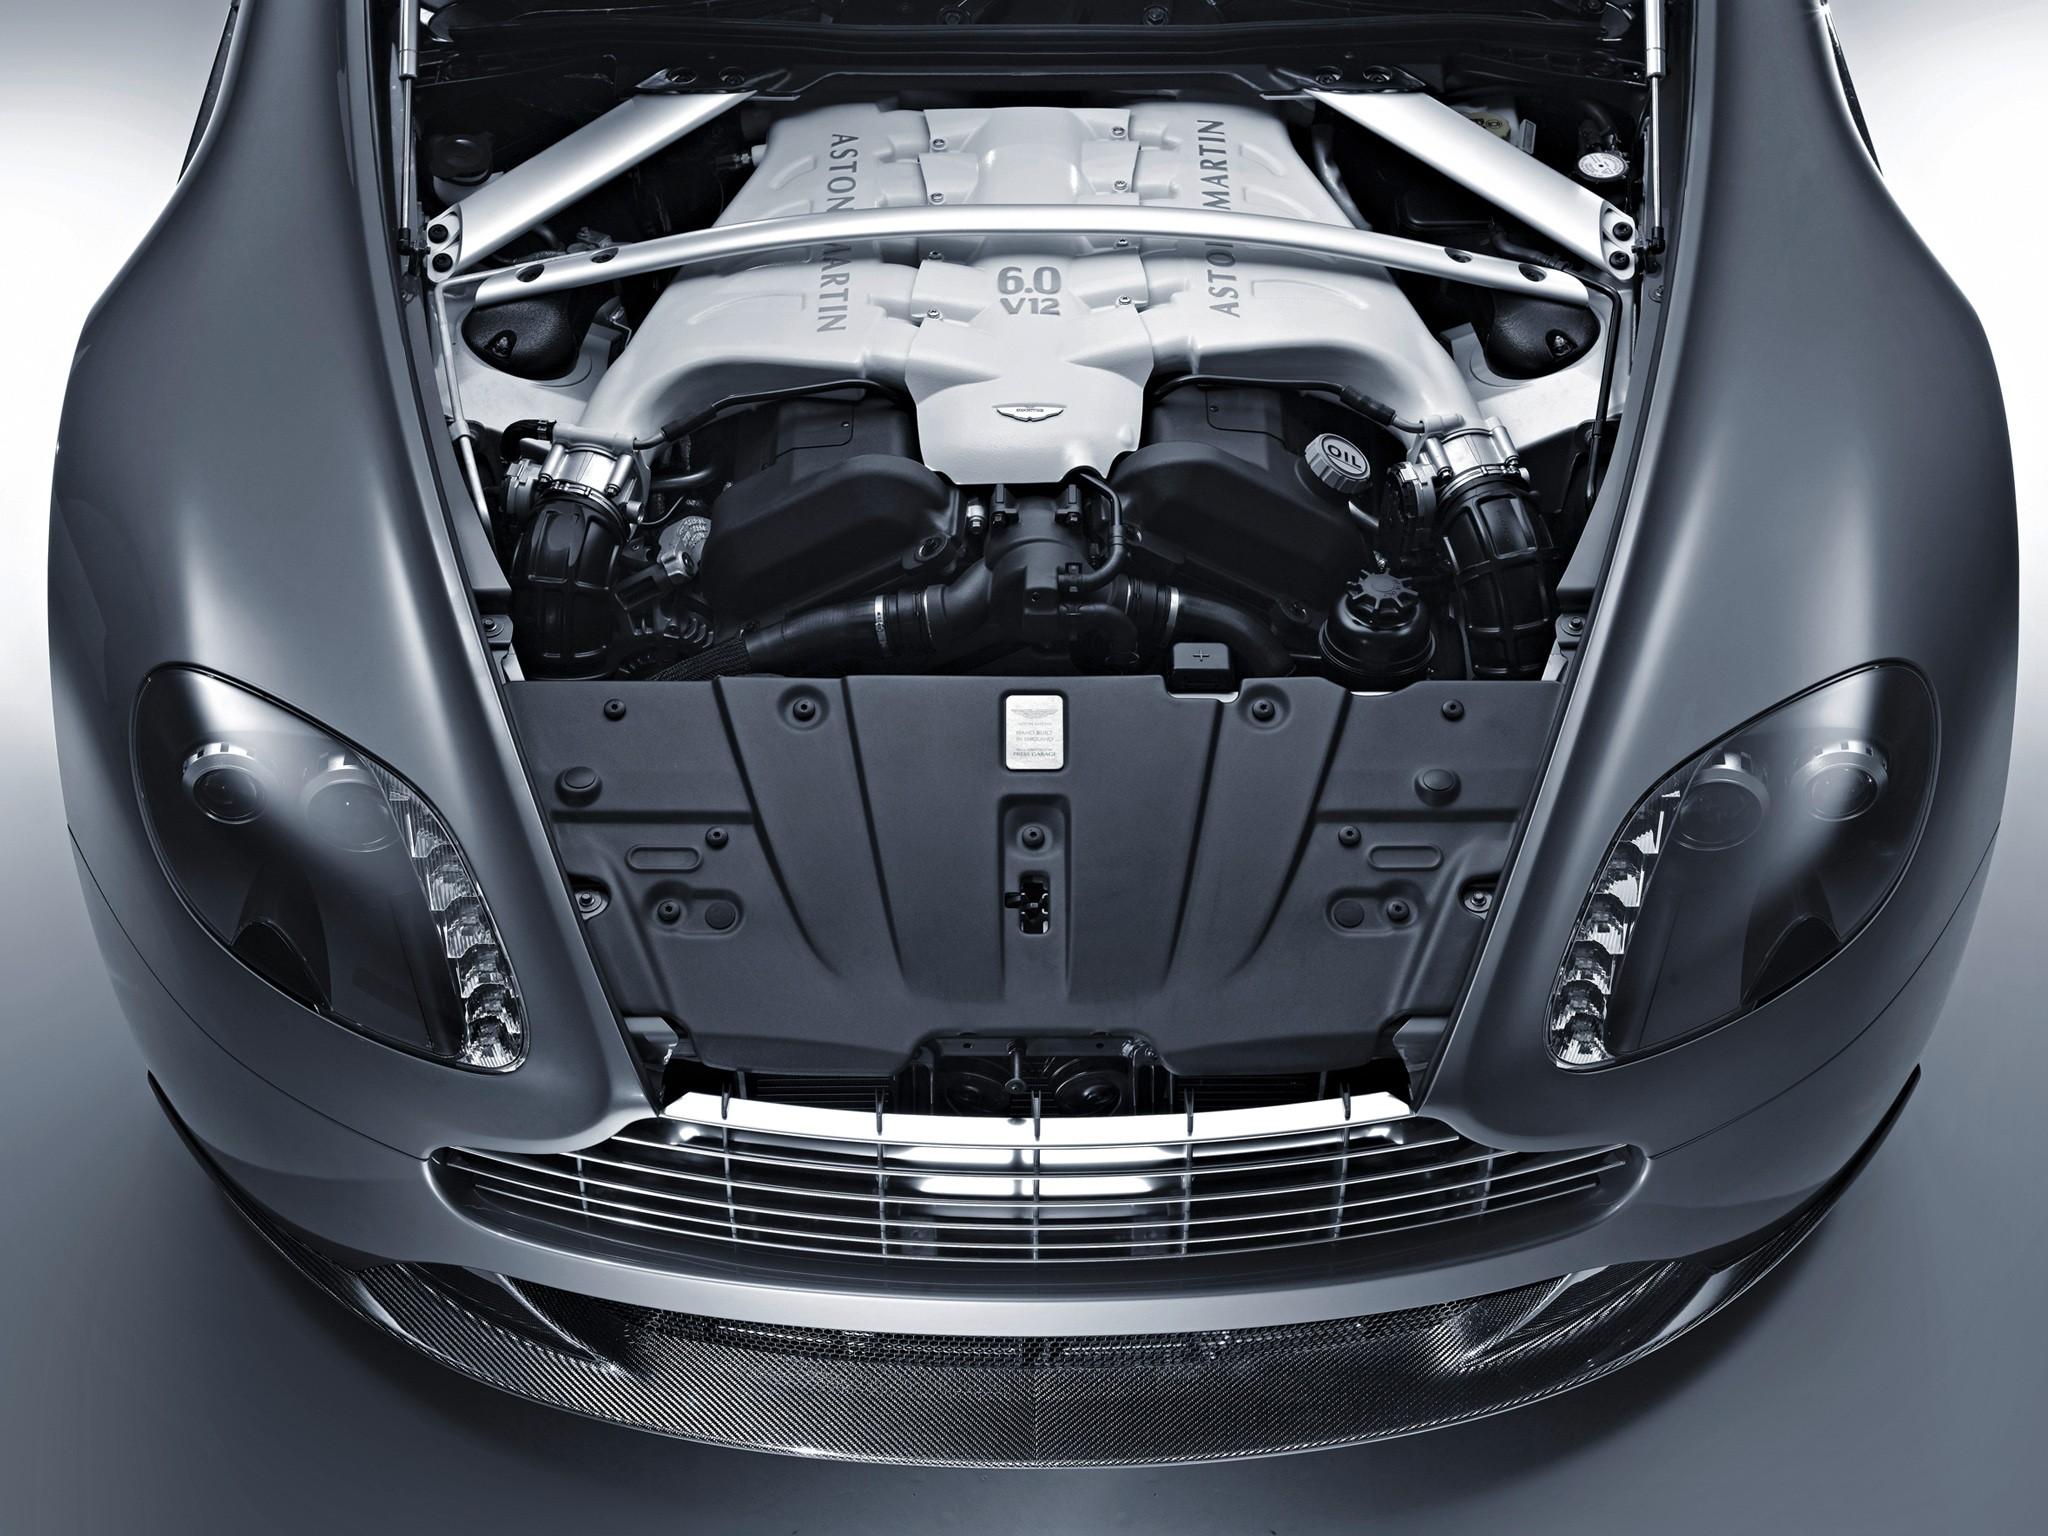 Aston Martin V12 Vantage Specs Photos 2009 2010 2011 2012 2013 Autoevolution